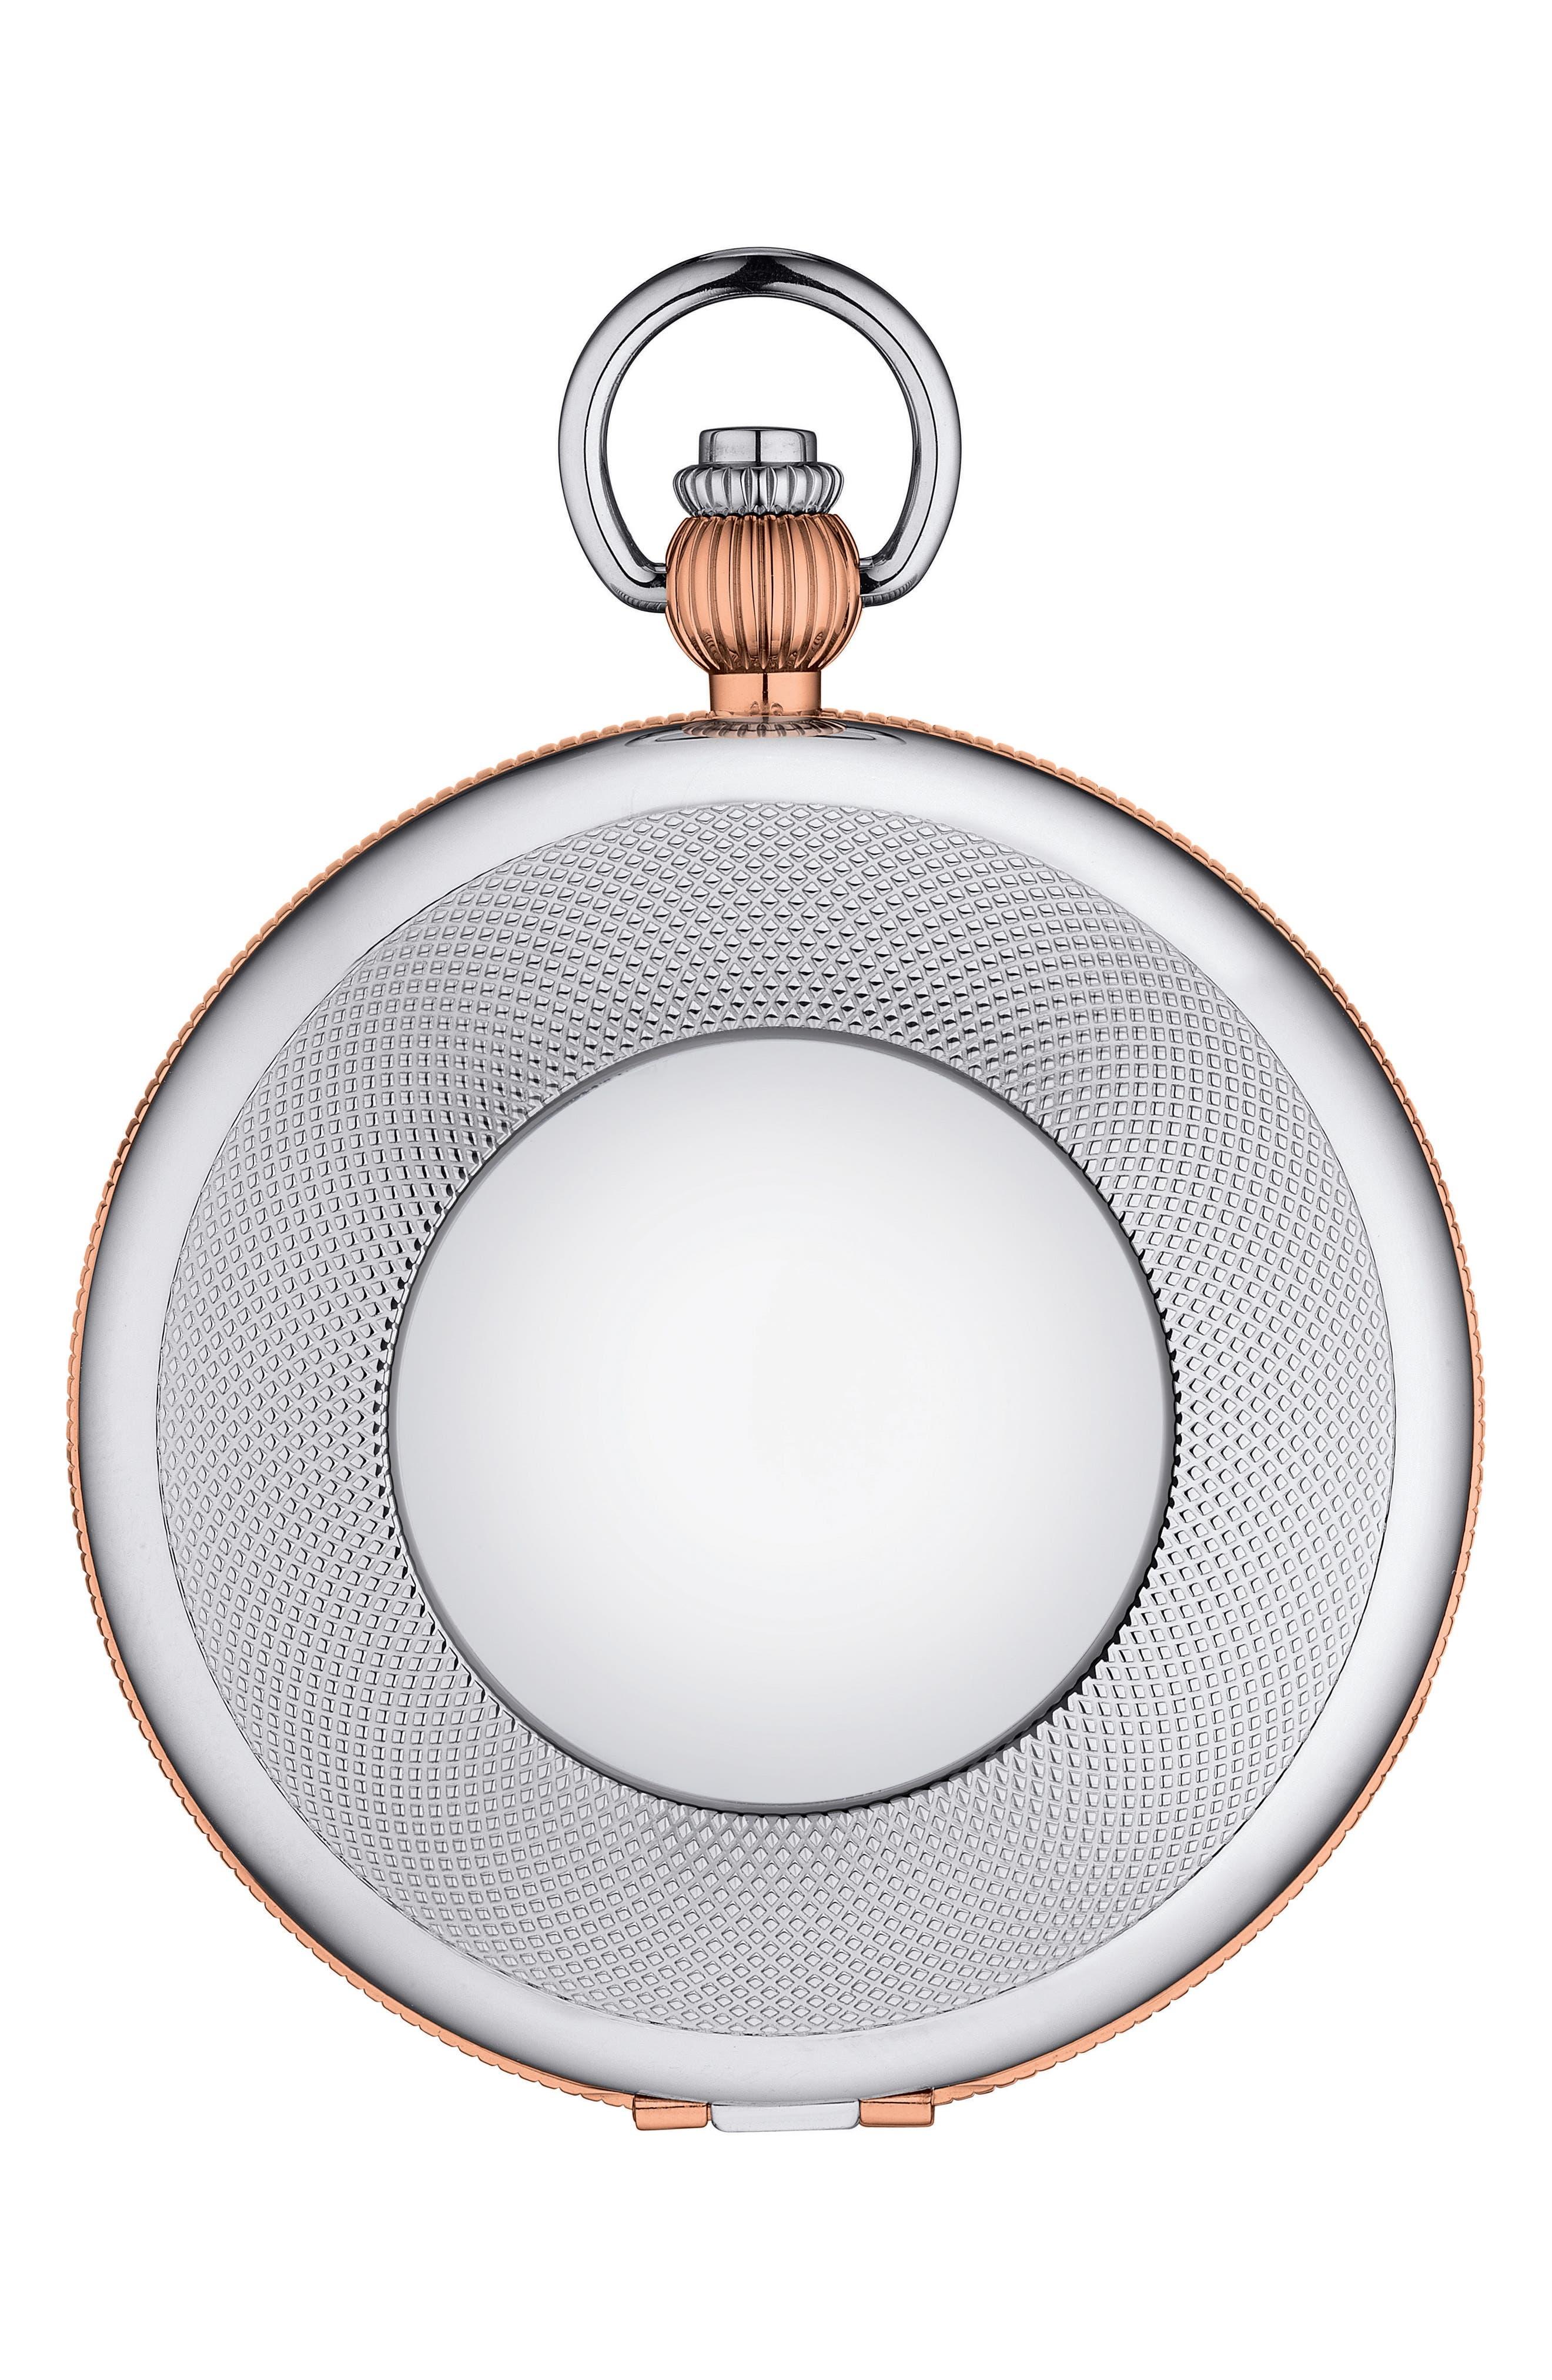 Bridgeport Mechanical Pocket Watch, 47mm,                             Alternate thumbnail 2, color,                             SILVER/ ROSE GOLD